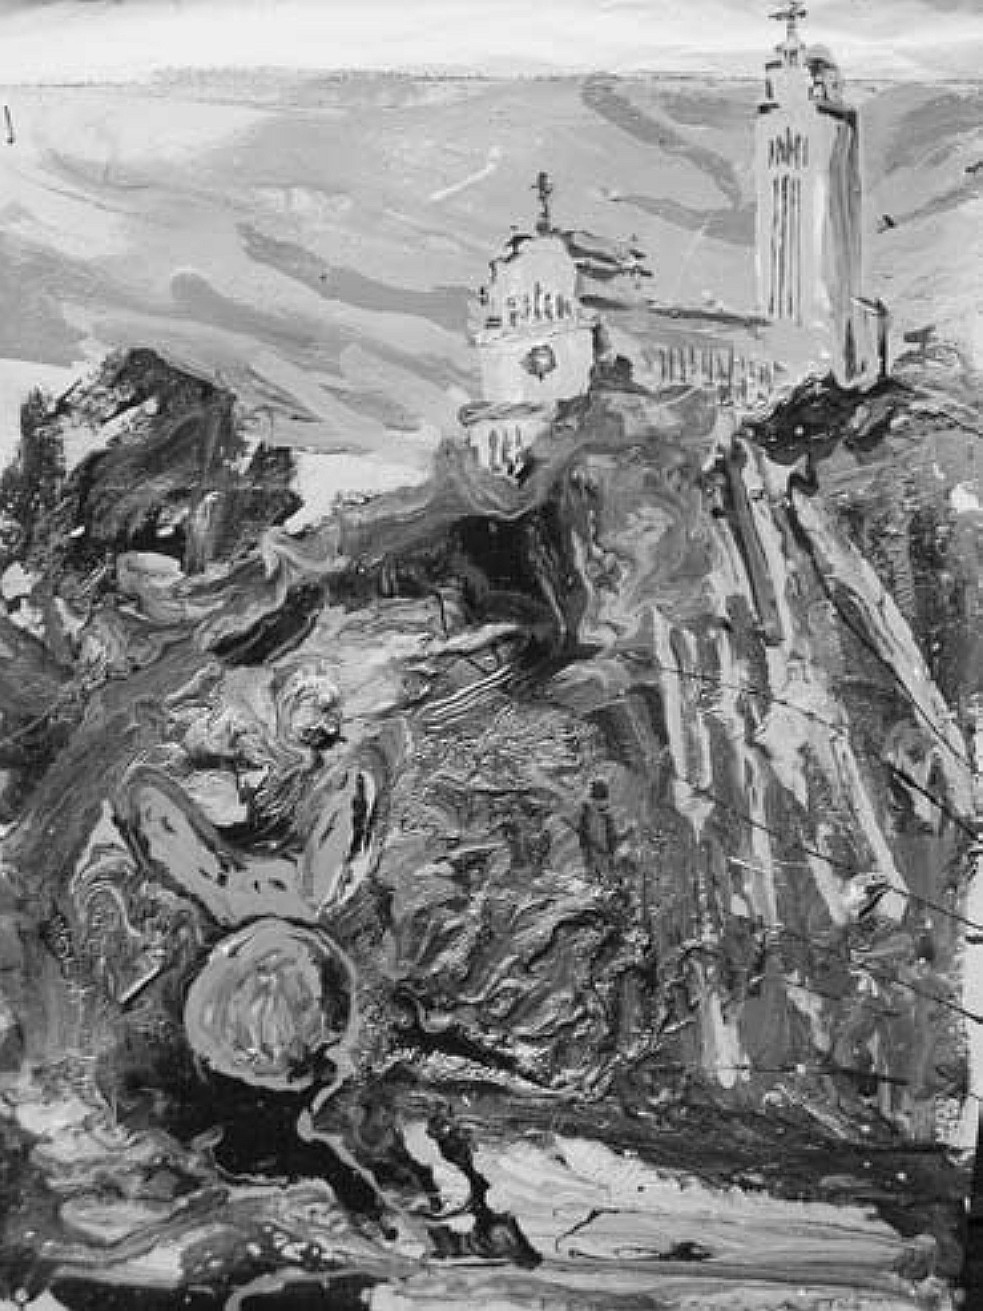 "1 il. Aušra Barzdukaitė-Vaitkūnienė, ""Prisikėlimo bažnyčia: sapno realybė"", 2008, pop., emal. 40 × 30 cm"